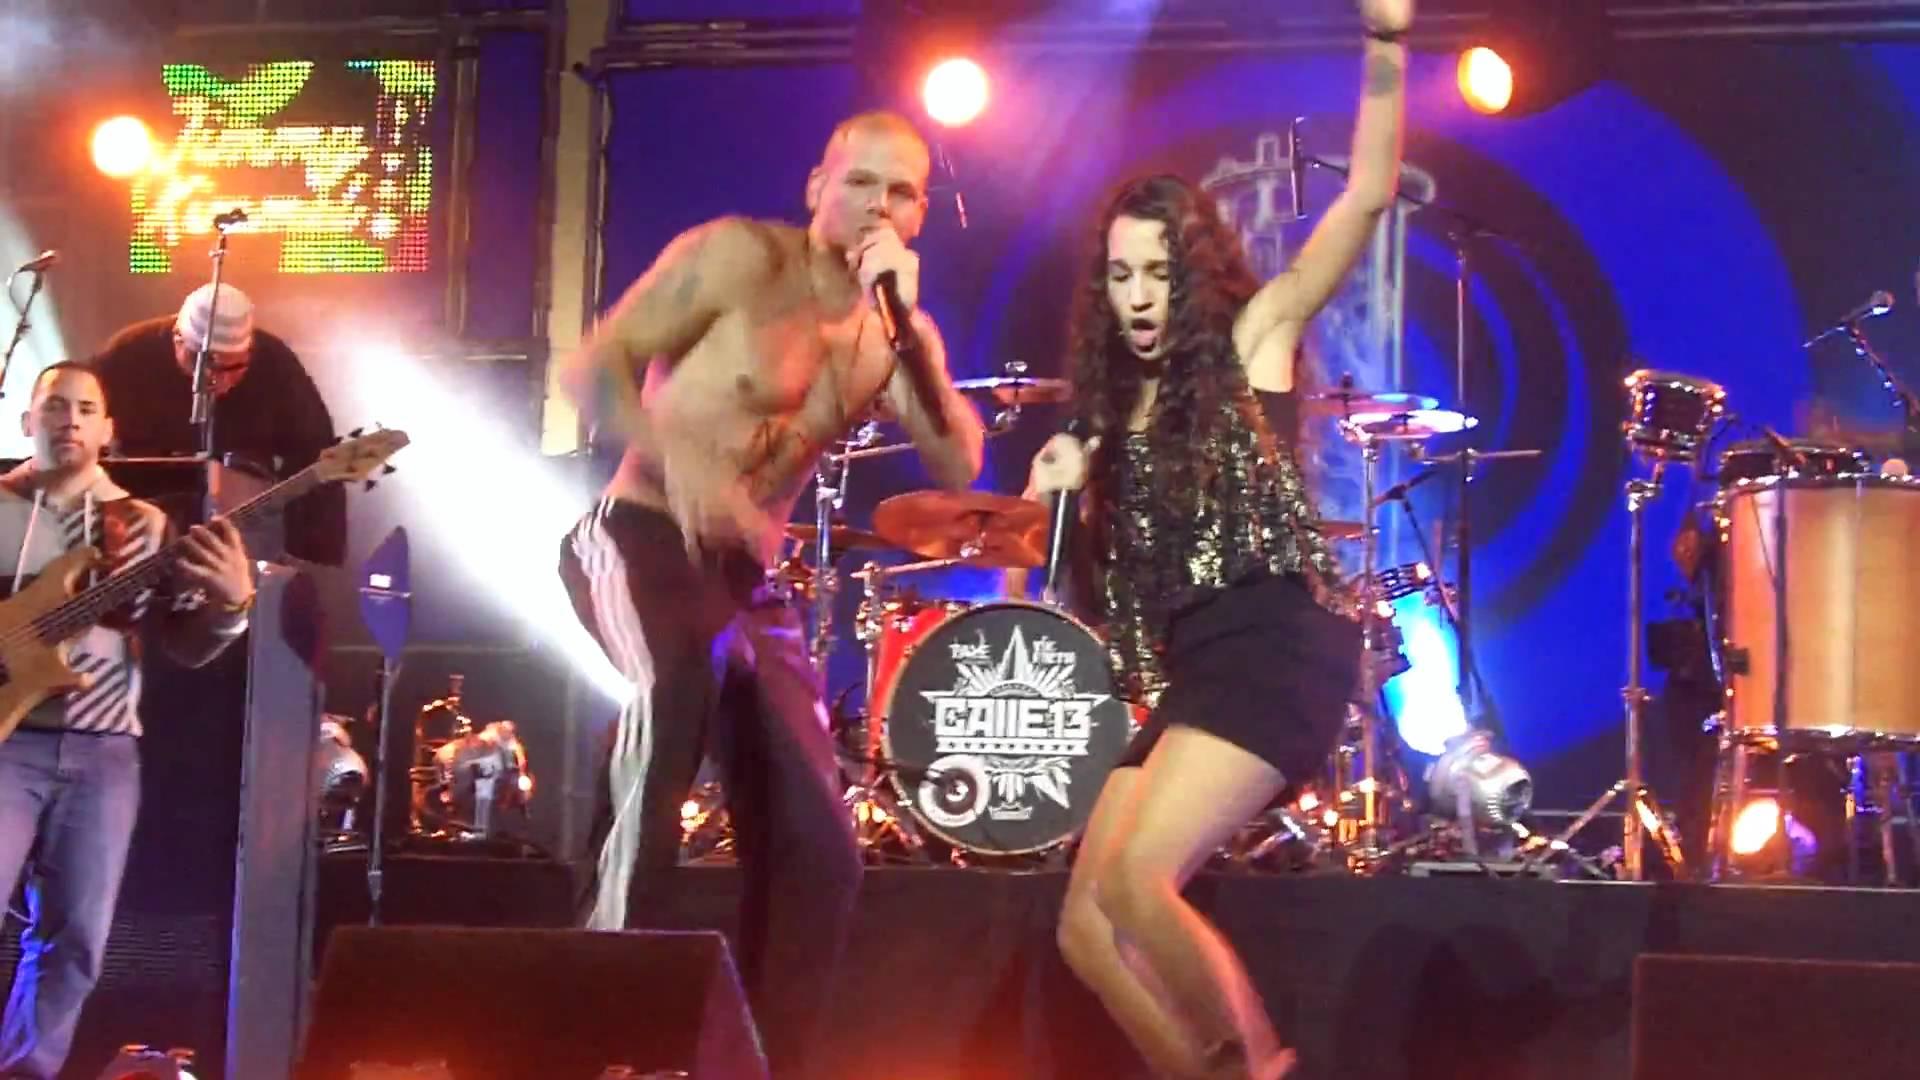 Ileana Cabra, la cantante de Calle 13, vuelve a Madrid